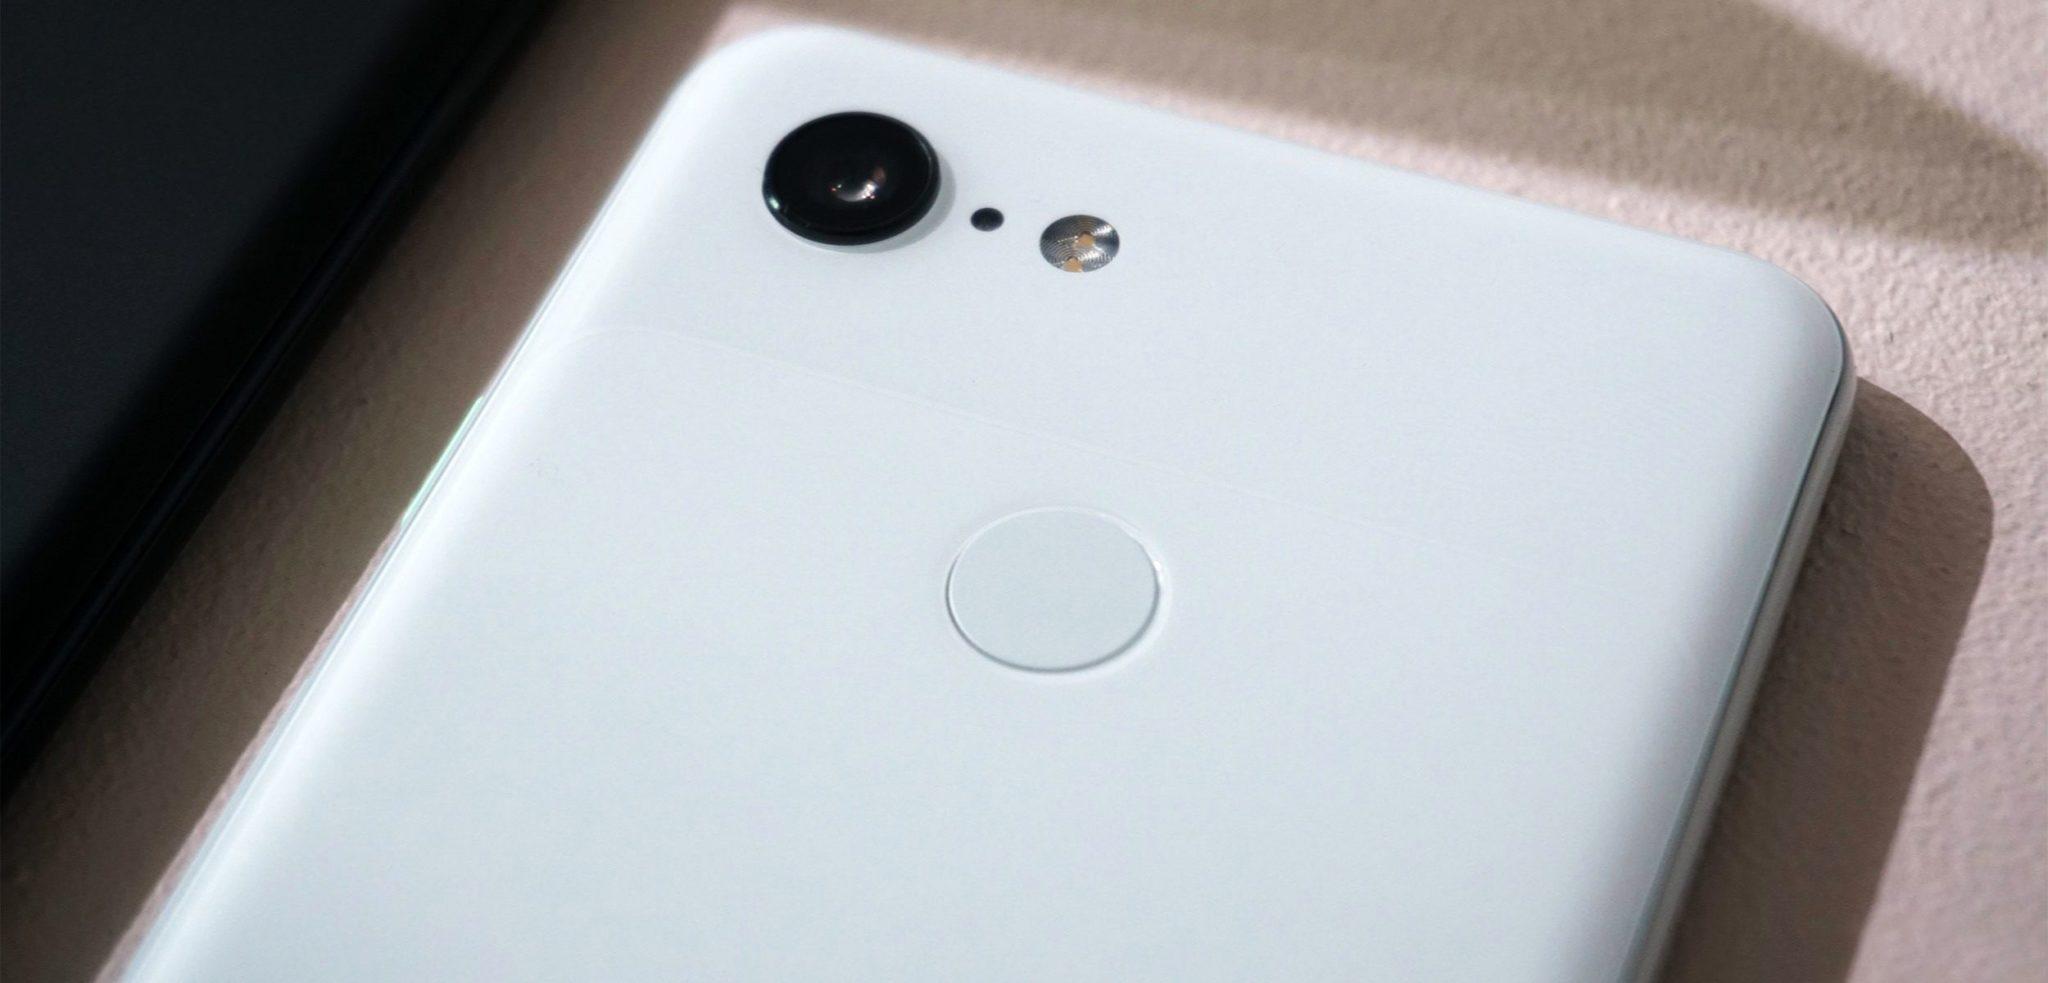 Google Pixel 3 smartphone with Night Sight Camera app